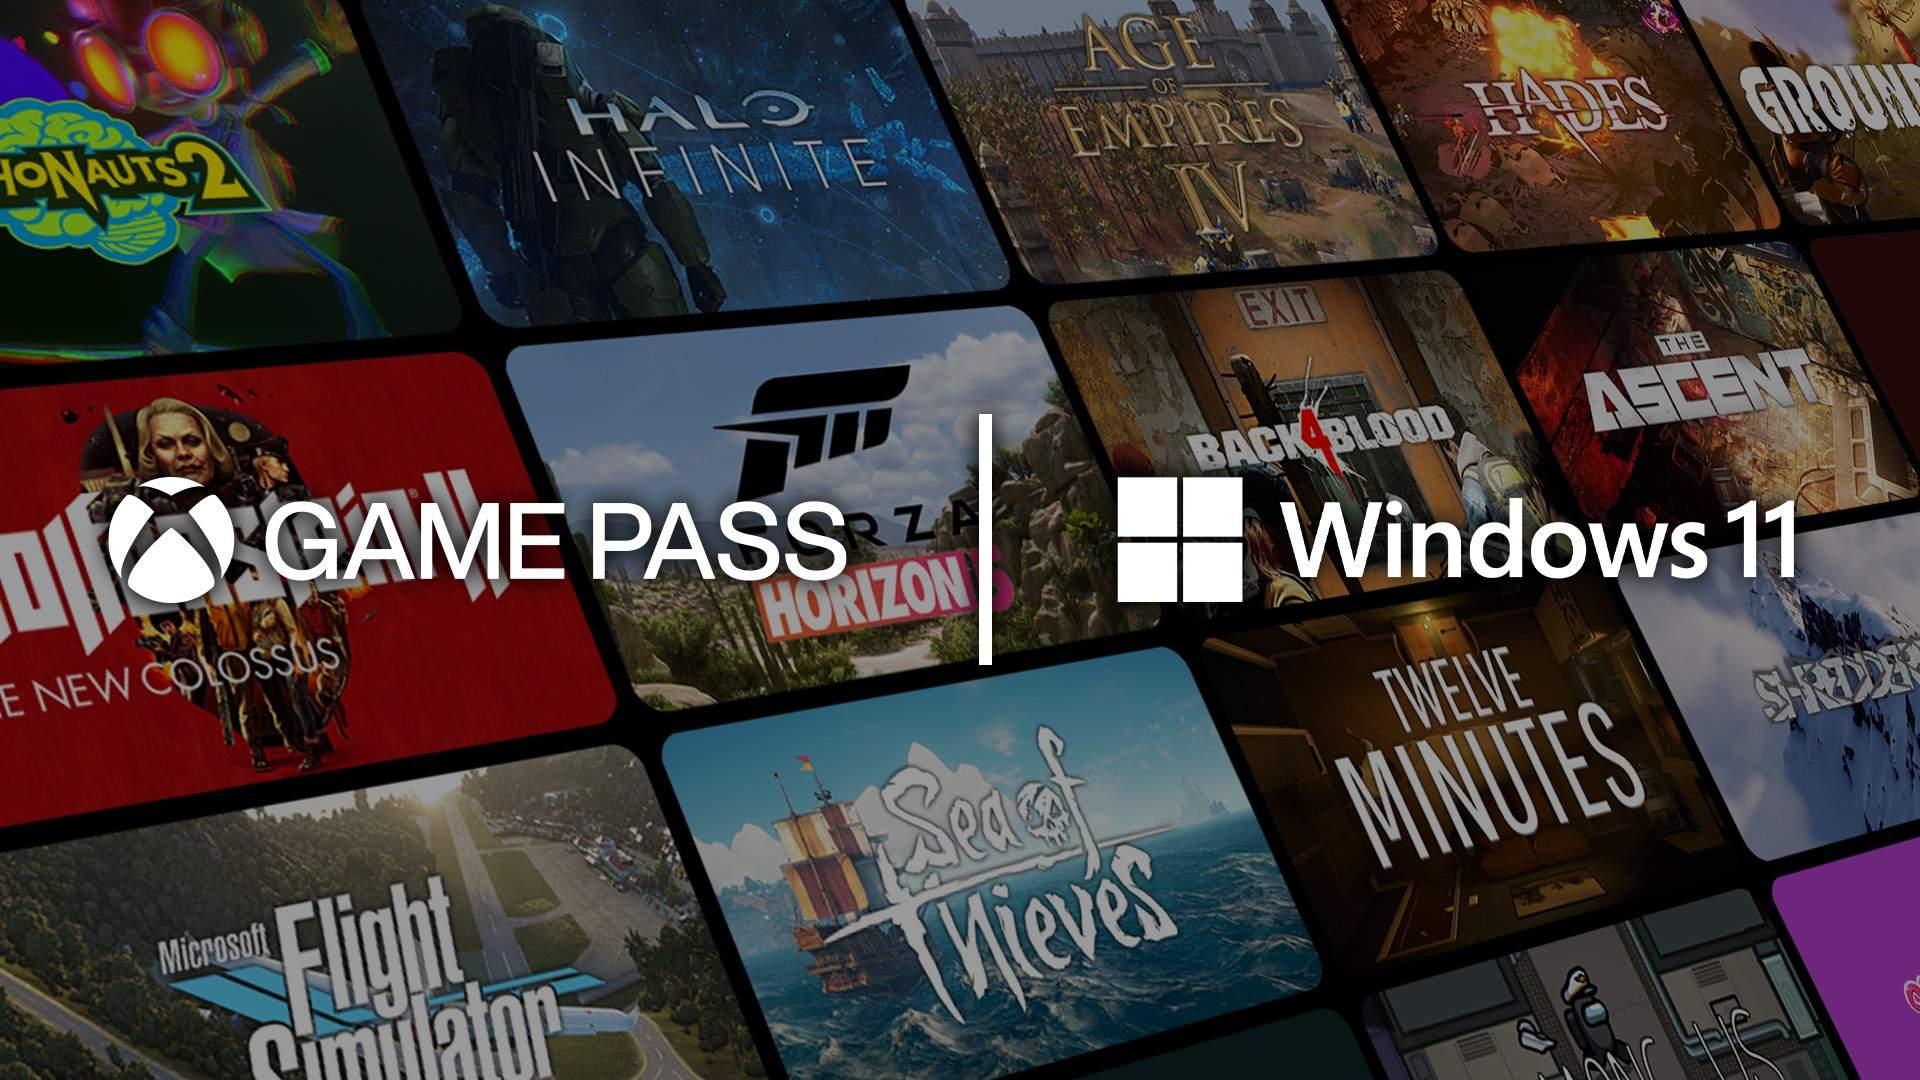 Xbox Game Pass - Windows 11